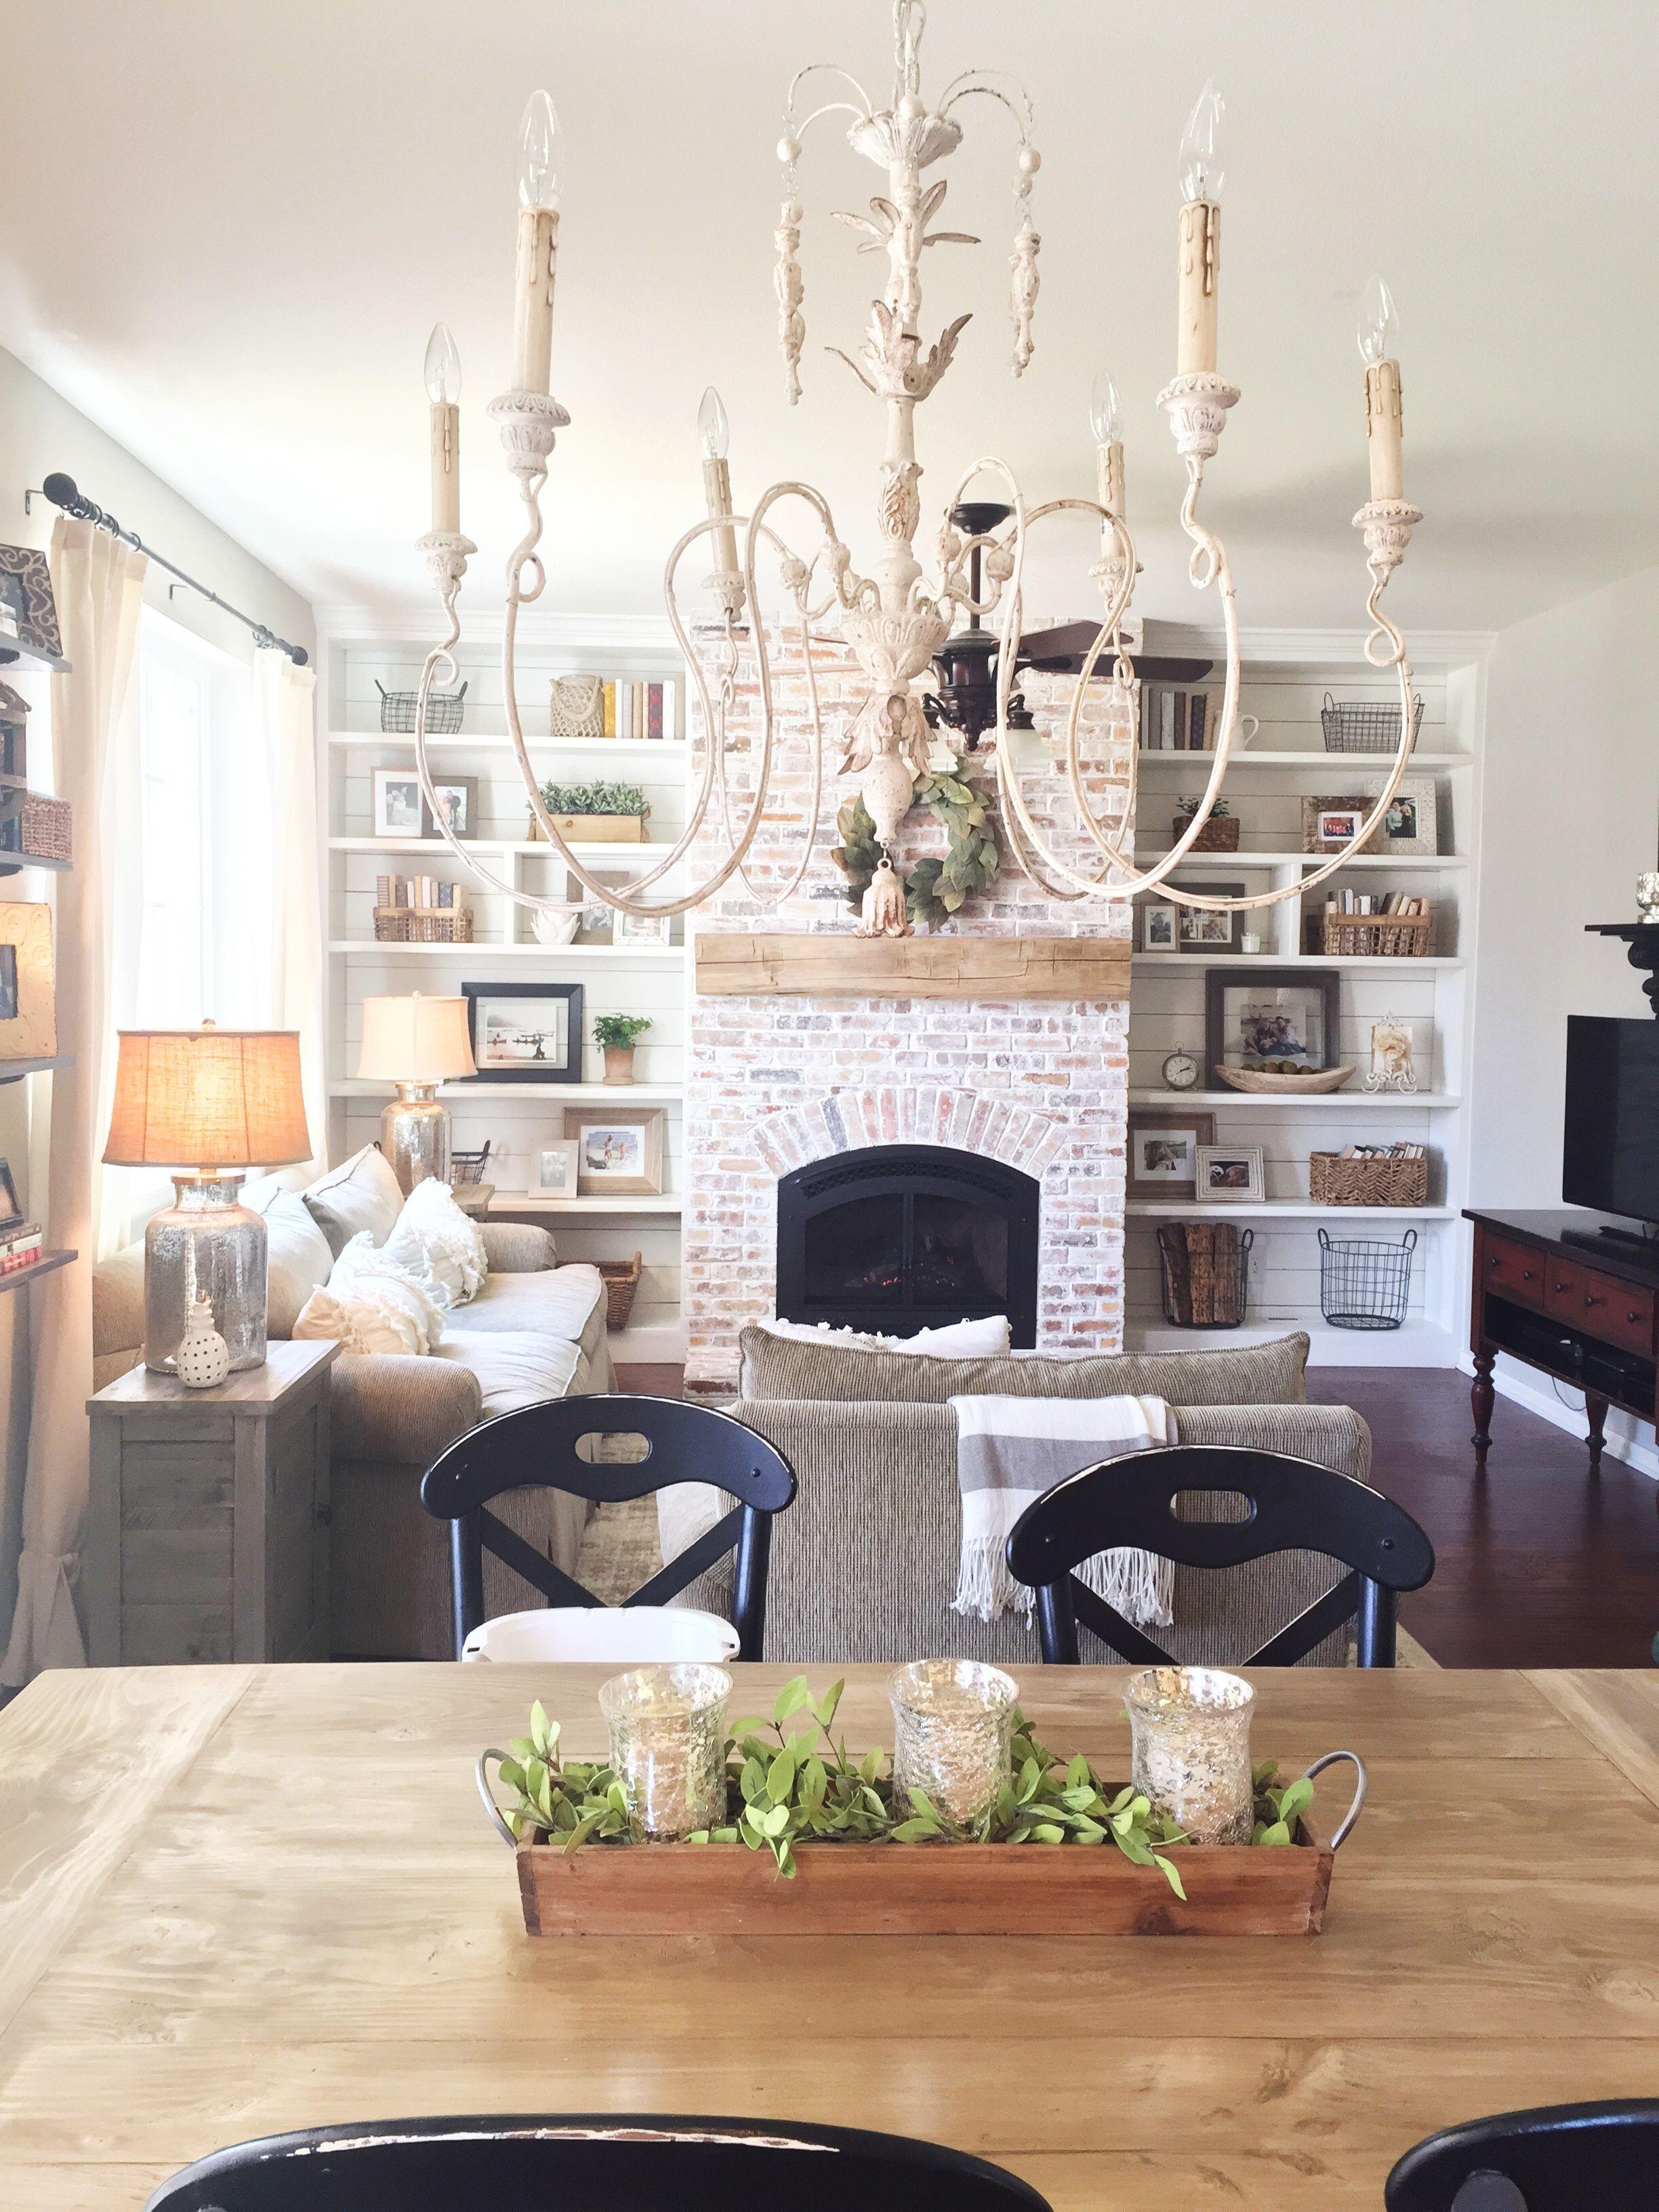 Bookshelves shiplap whitewash brick fireplace chandelier rustic